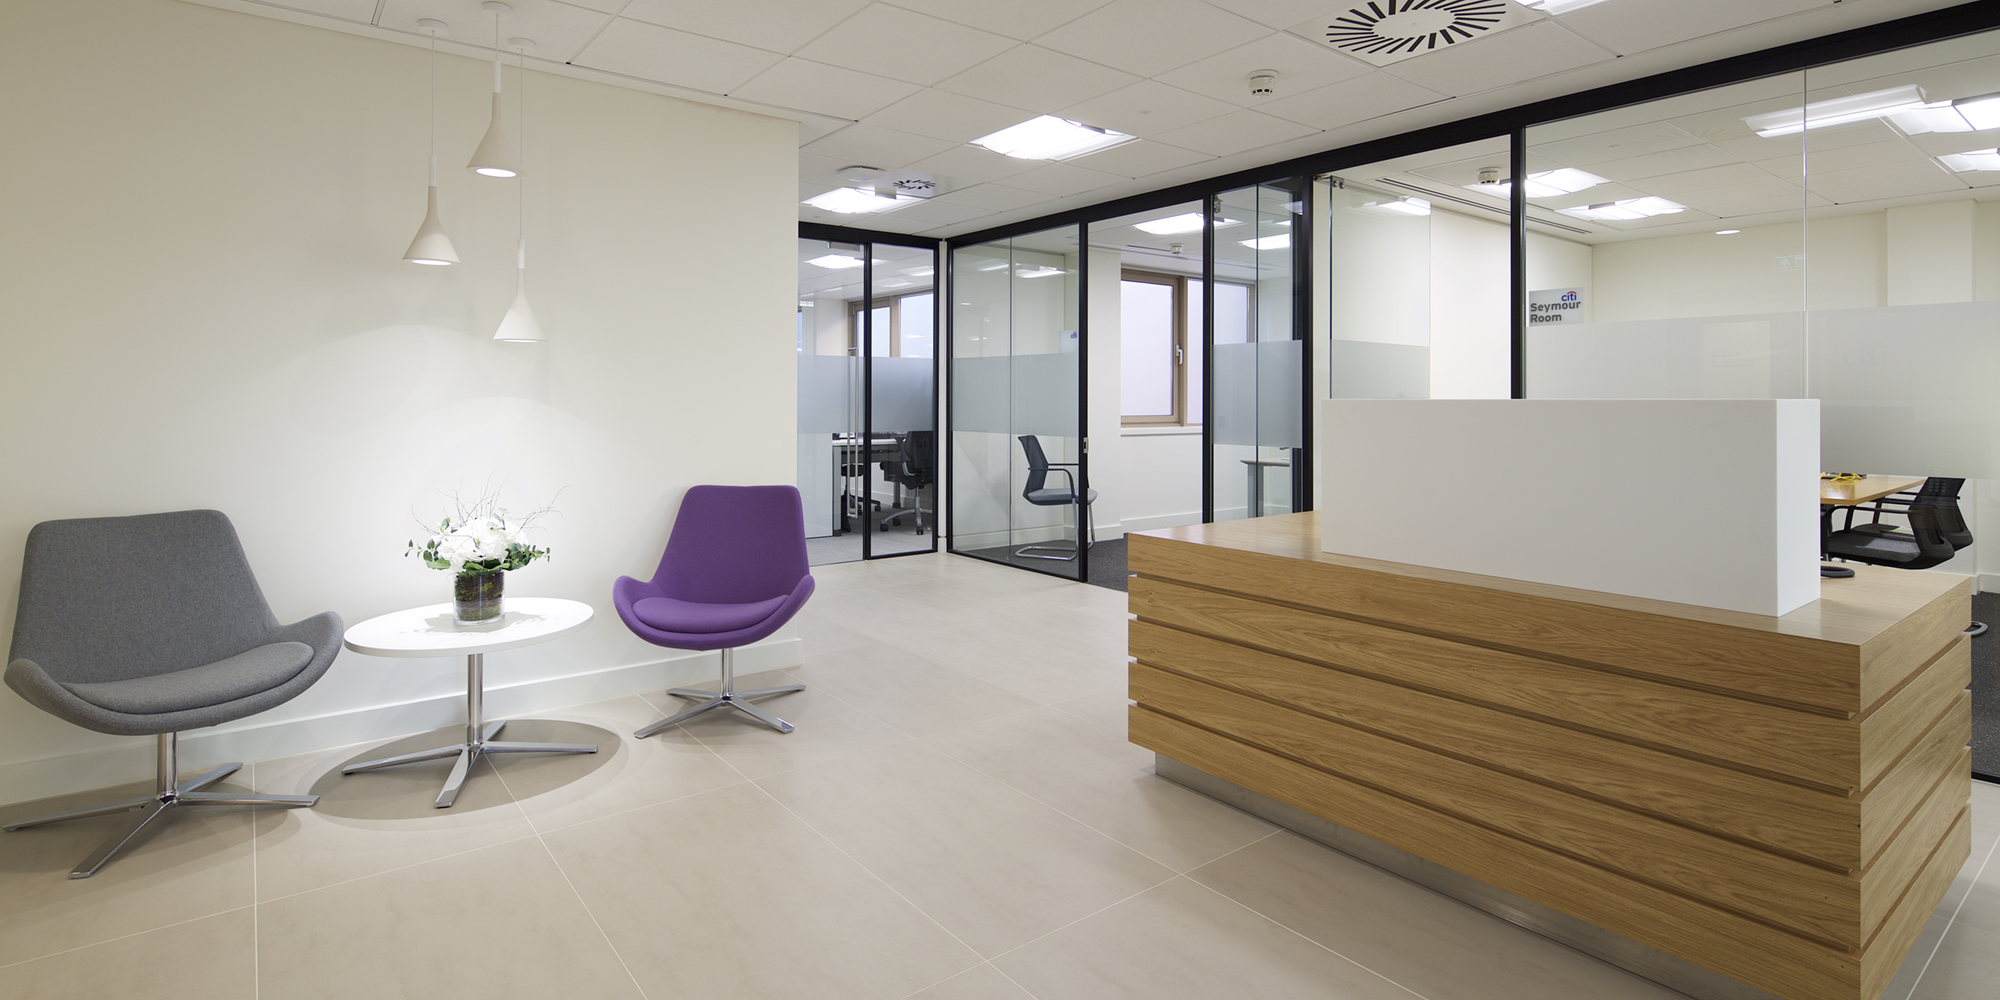 CITI BANK | St. Helier, Jersey | Axis Mason